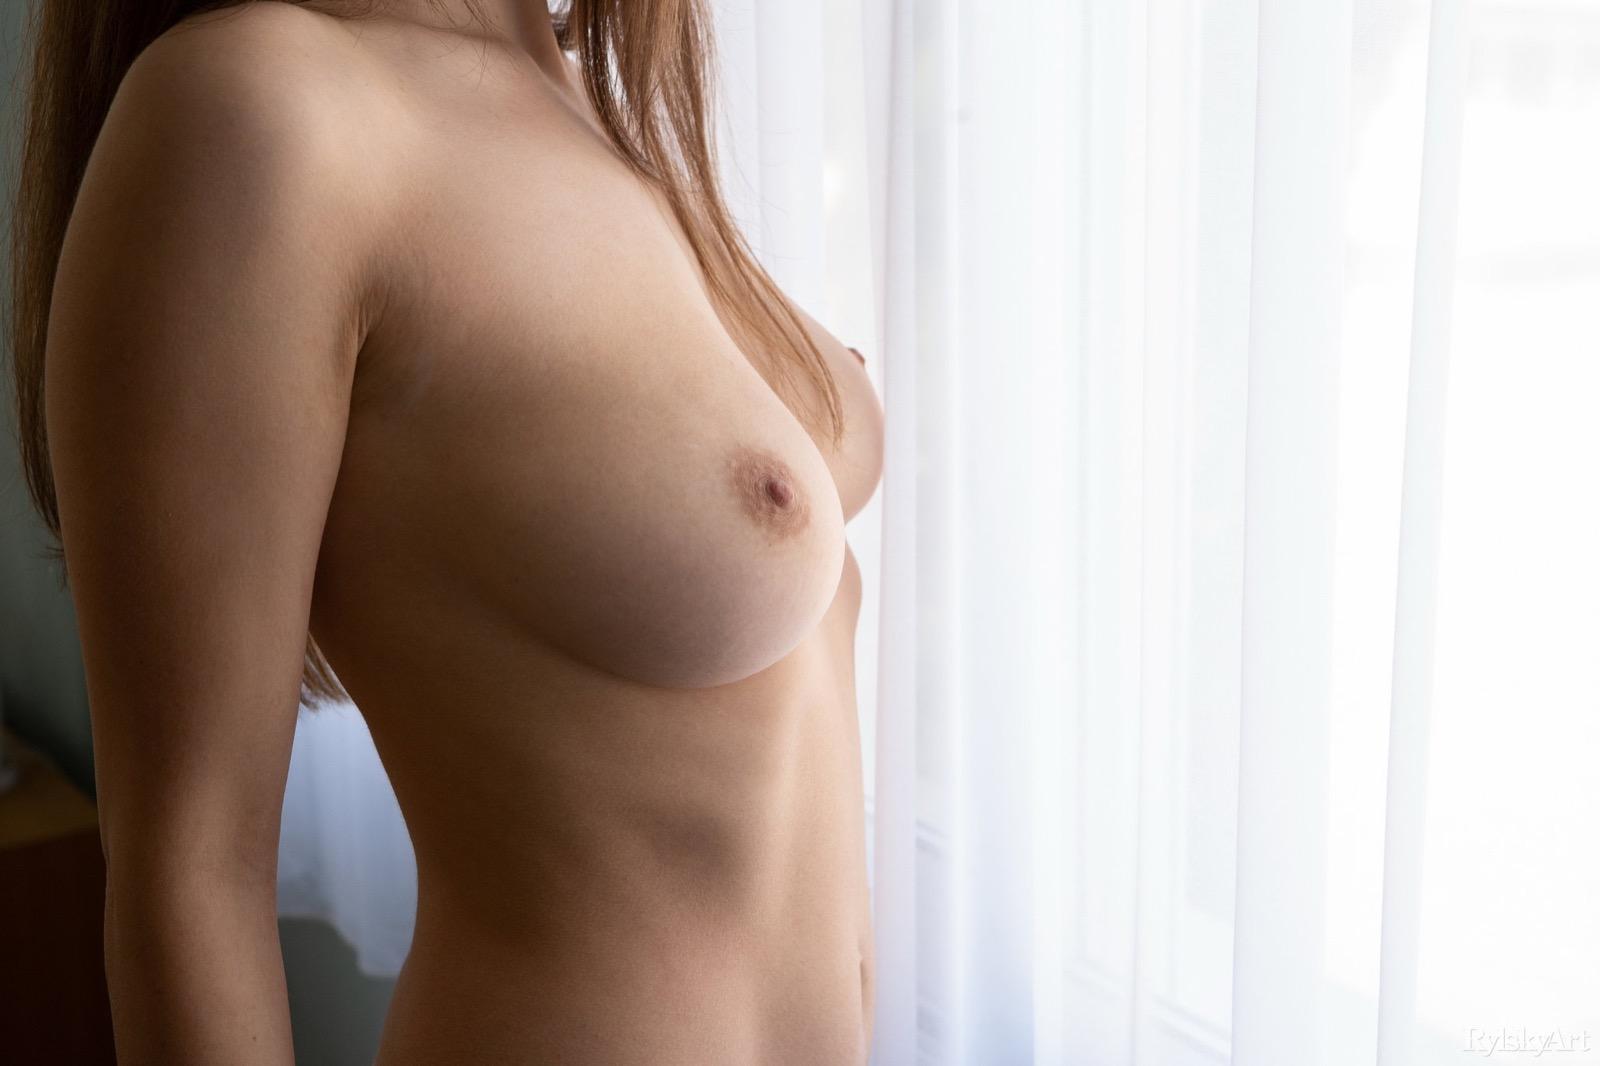 veronika_10990_4.jpg